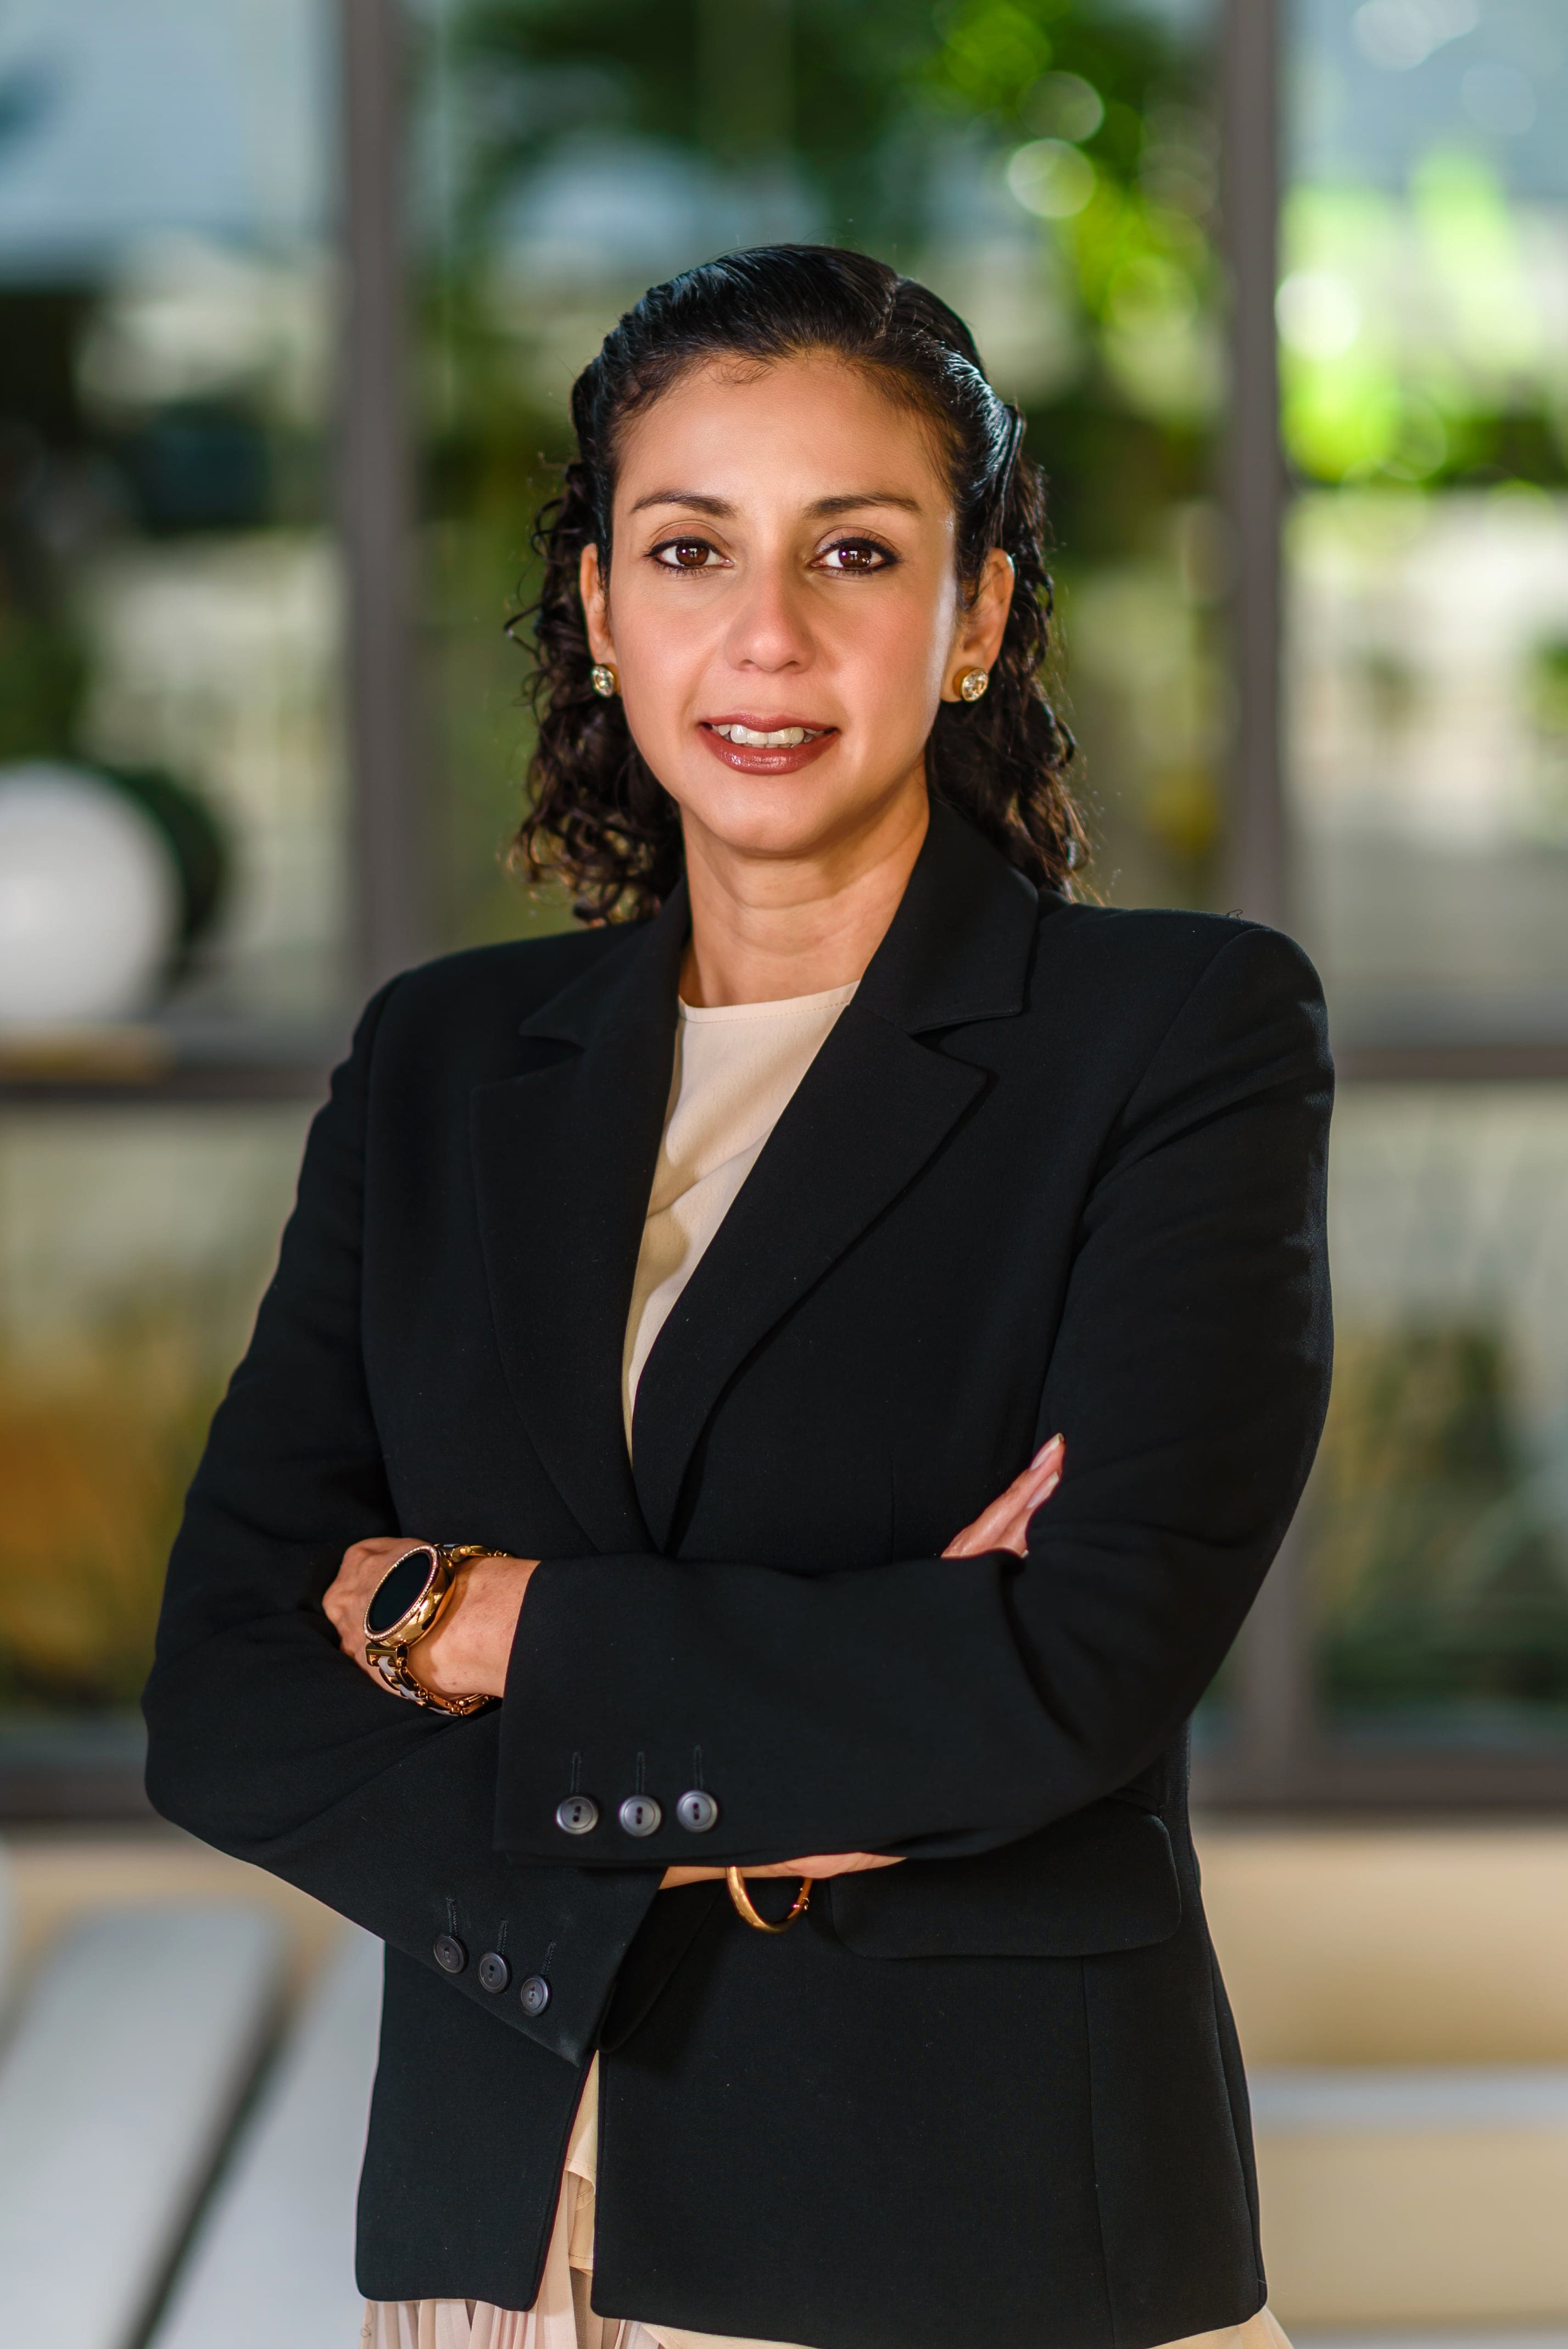 Sara Castellanos | Belong Specialist